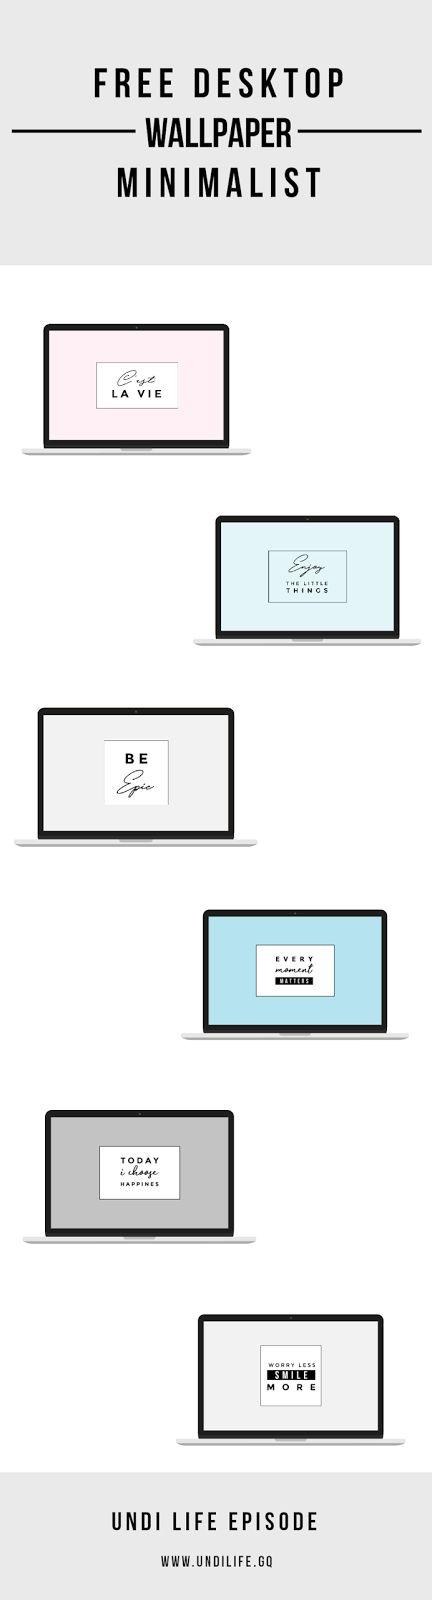 Free Minimalist Desktop Wallpaper | FREEBIE